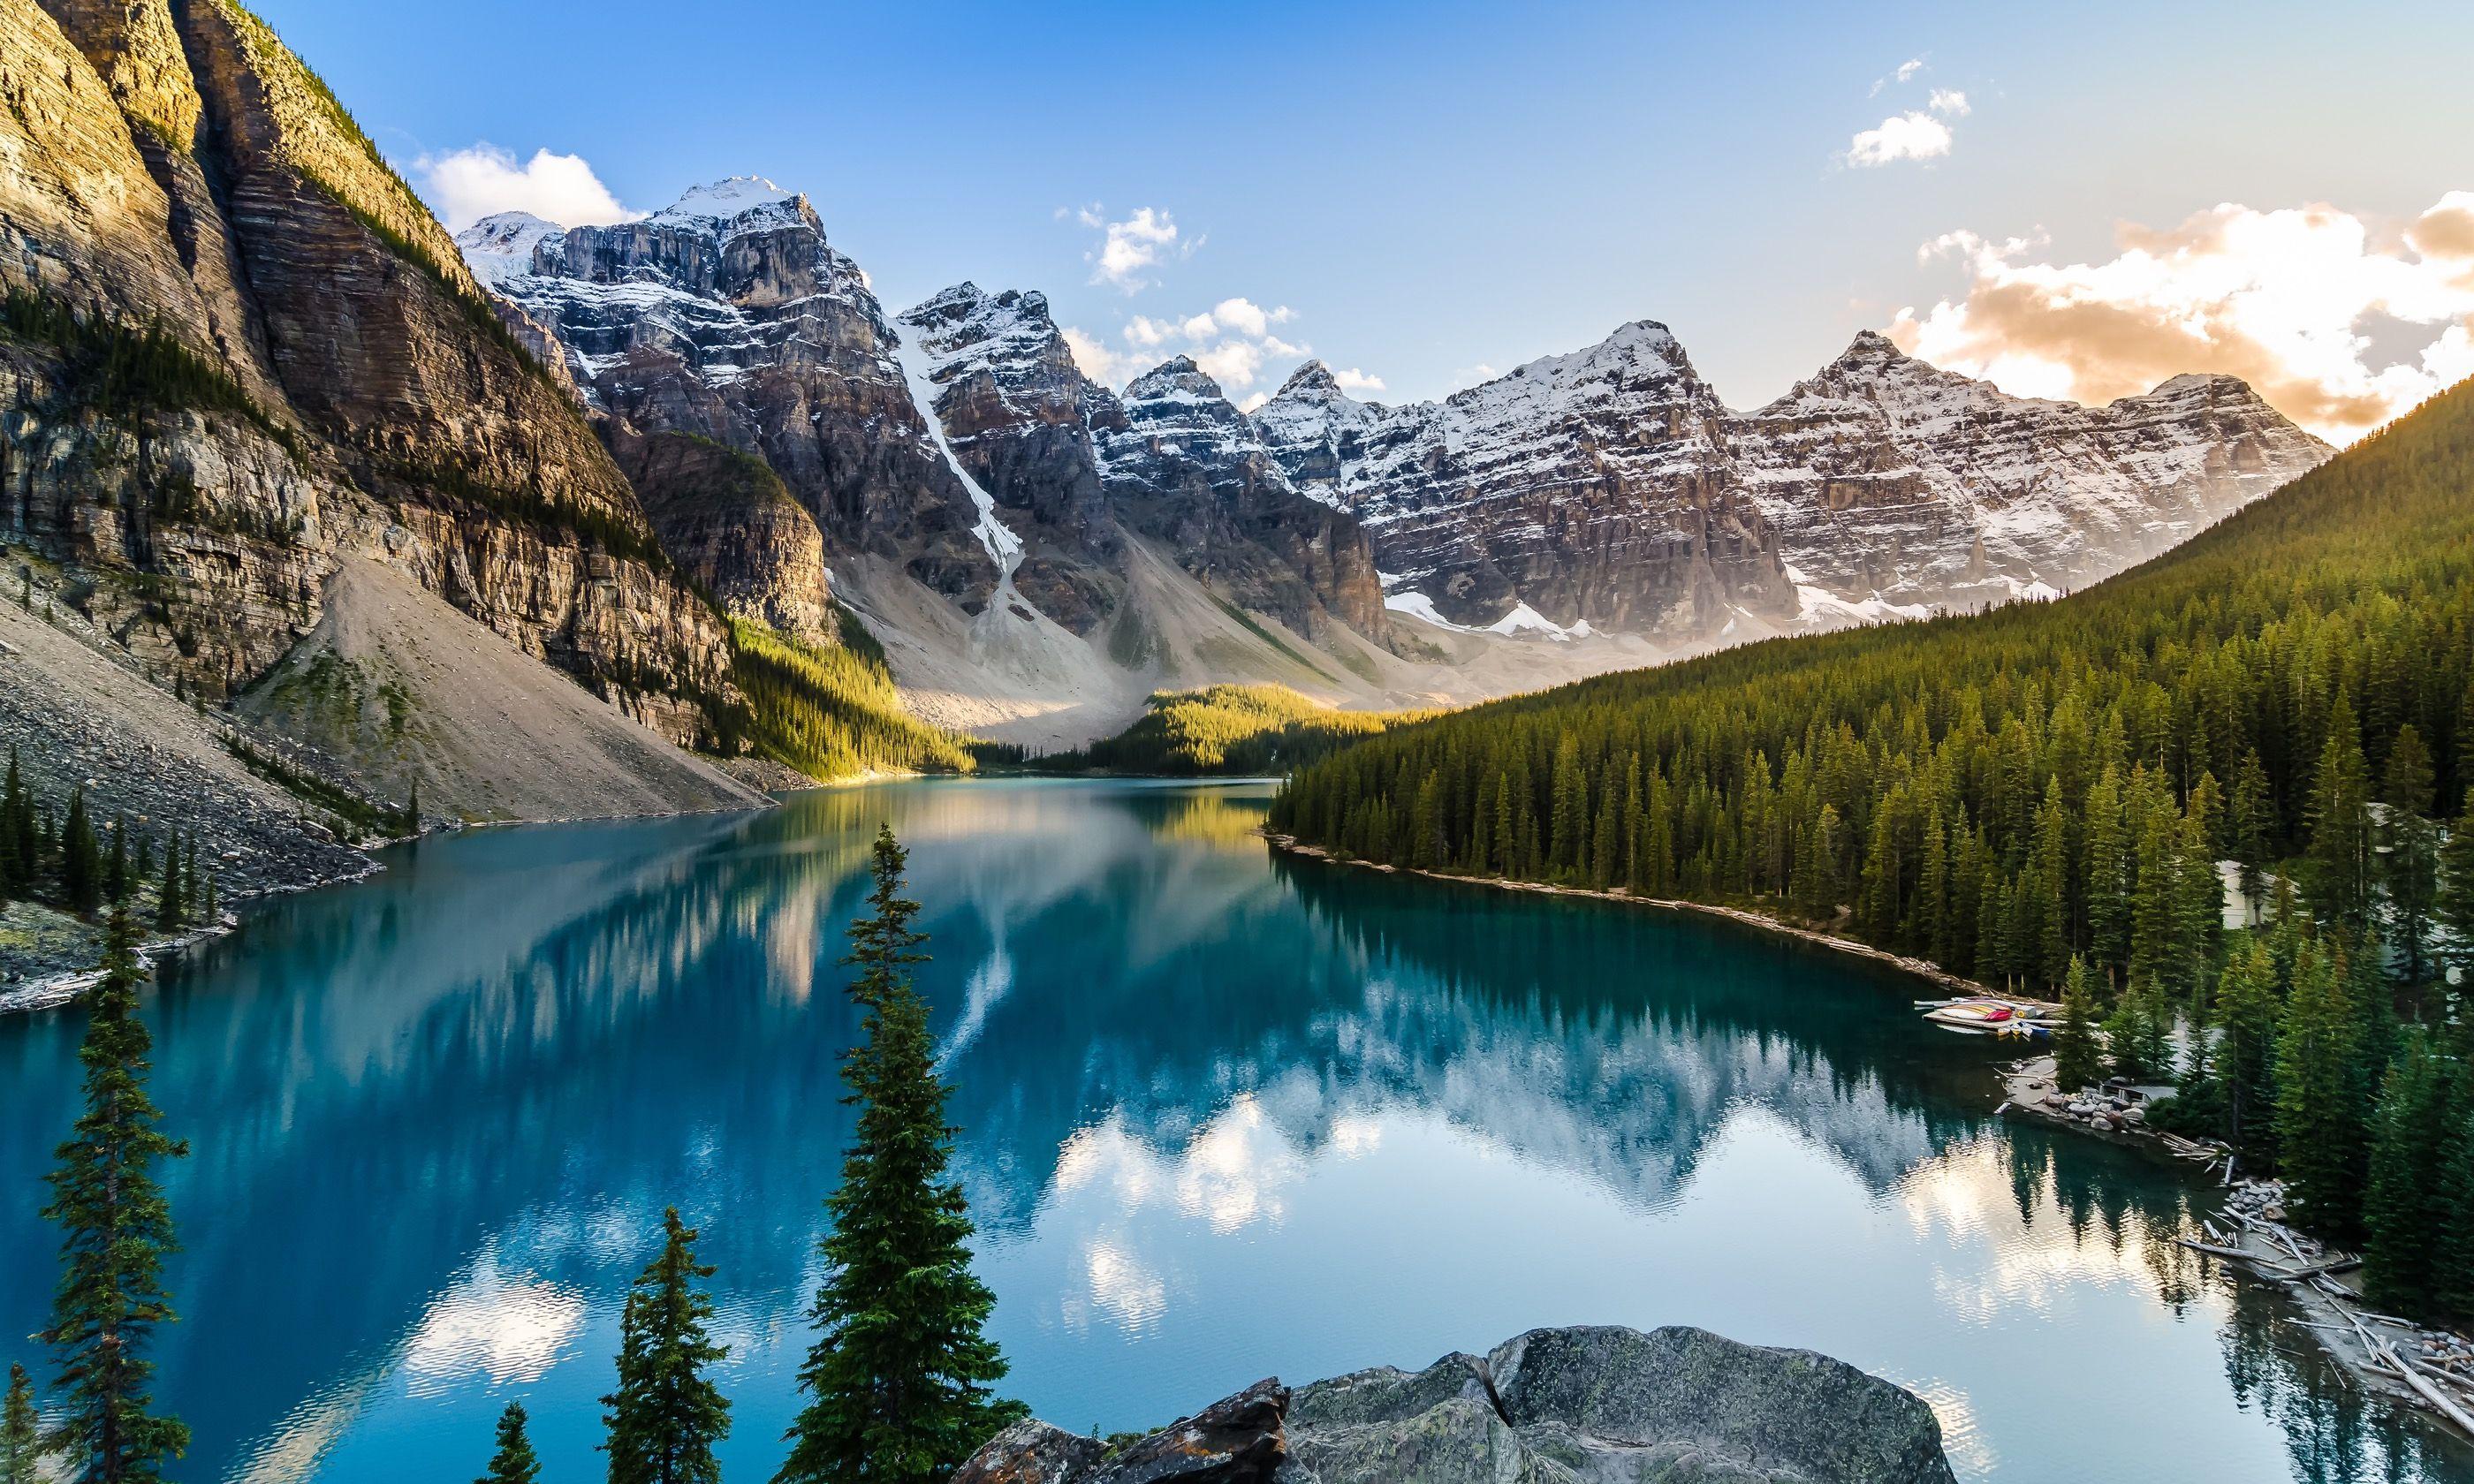 Moraine Lae in the Canadian Rockies (Dreamstime)